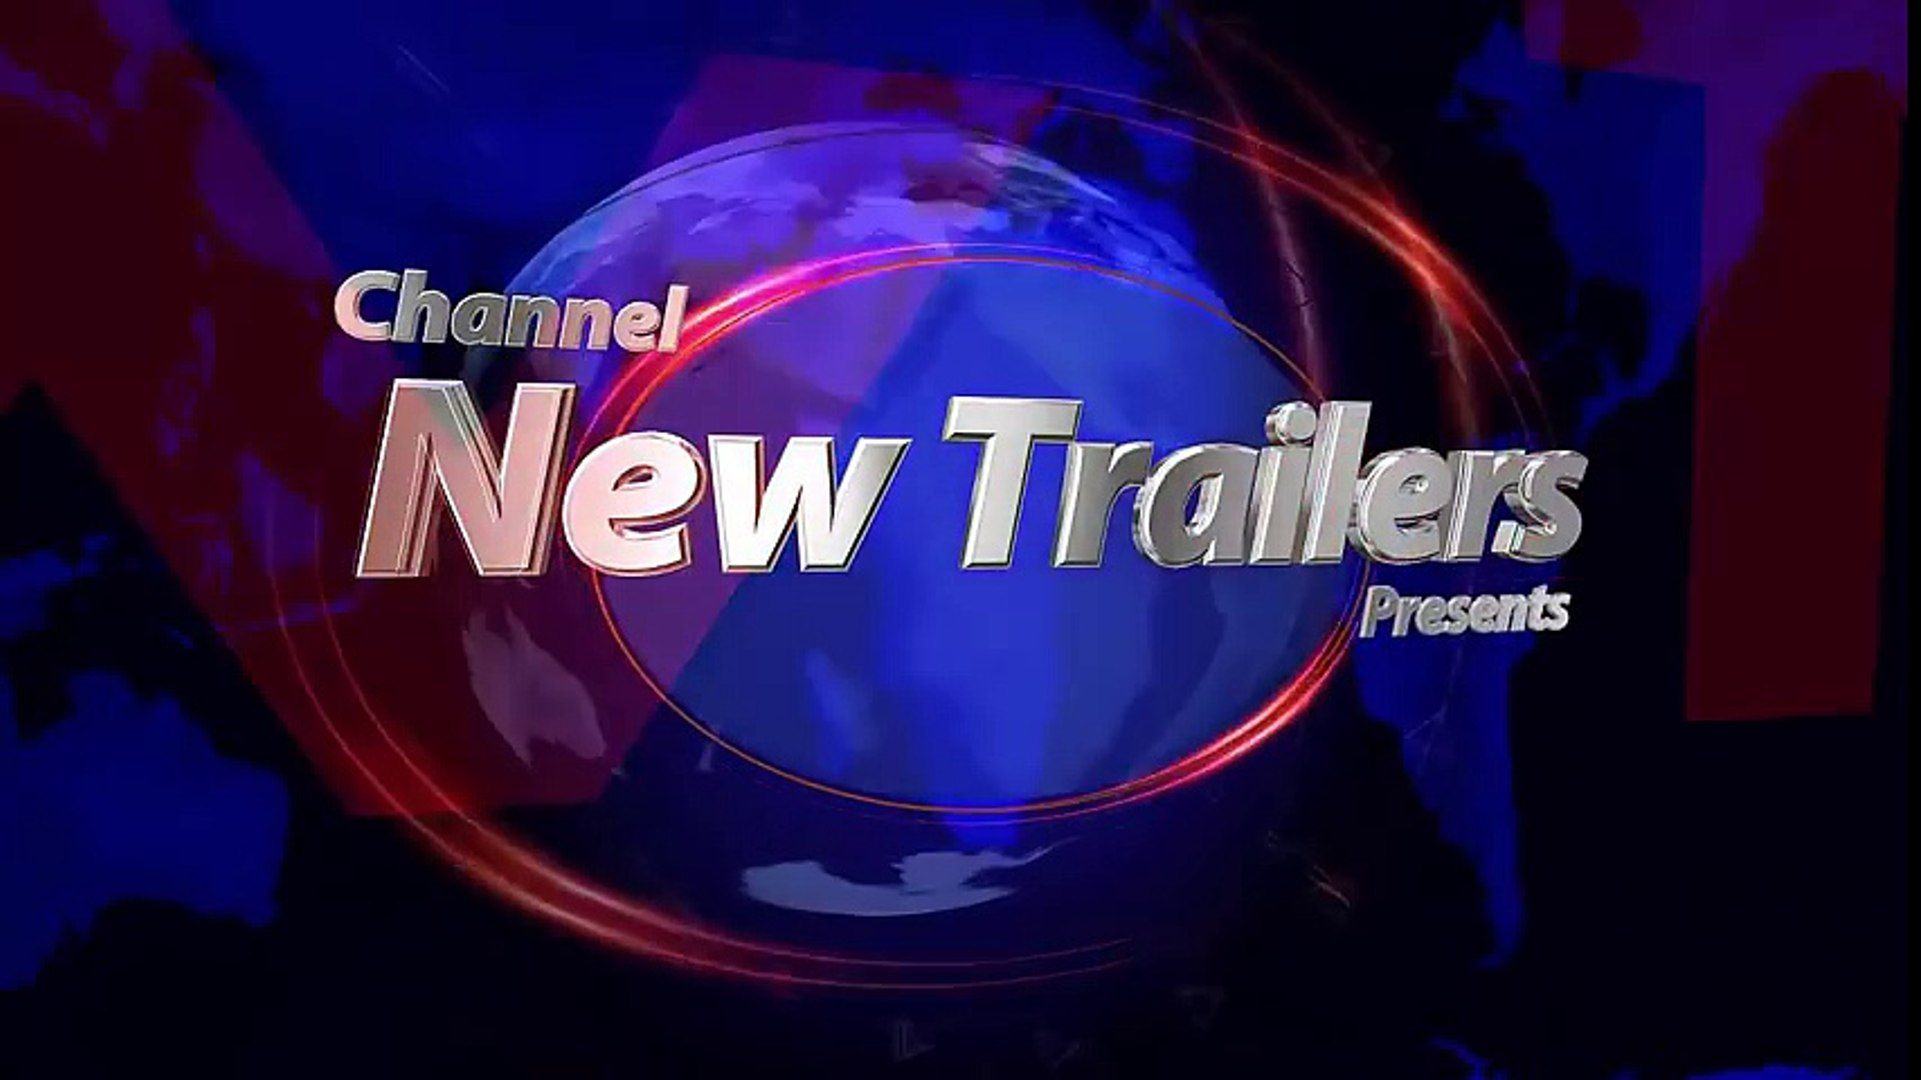 Три - Трейлер 2 (2015) Фильм ужасы - [Three - Trailer 2 (2015) Movie horror]